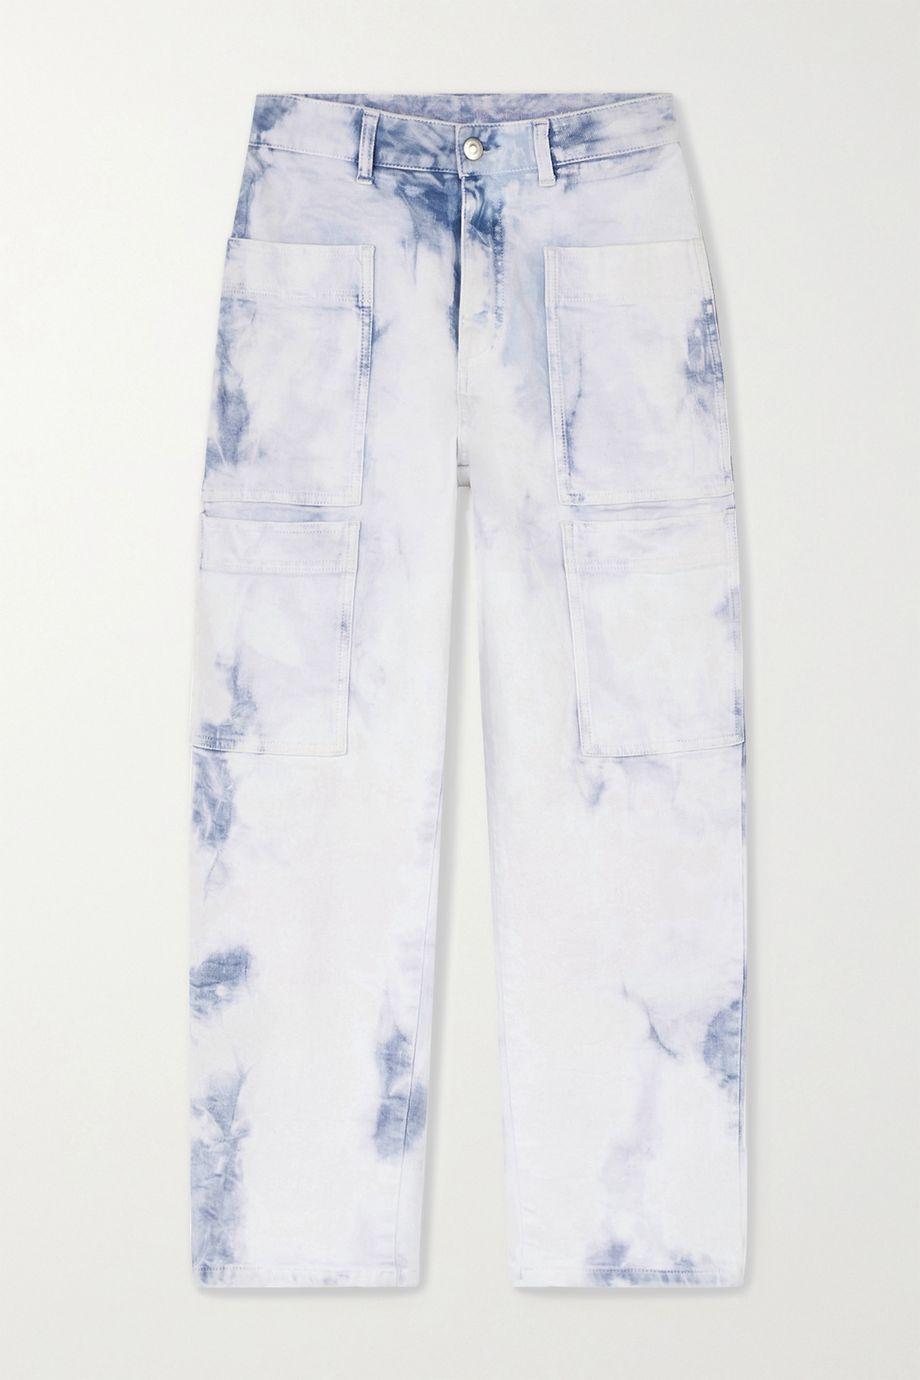 Stella McCartney Acid-wash boyfriend jeans